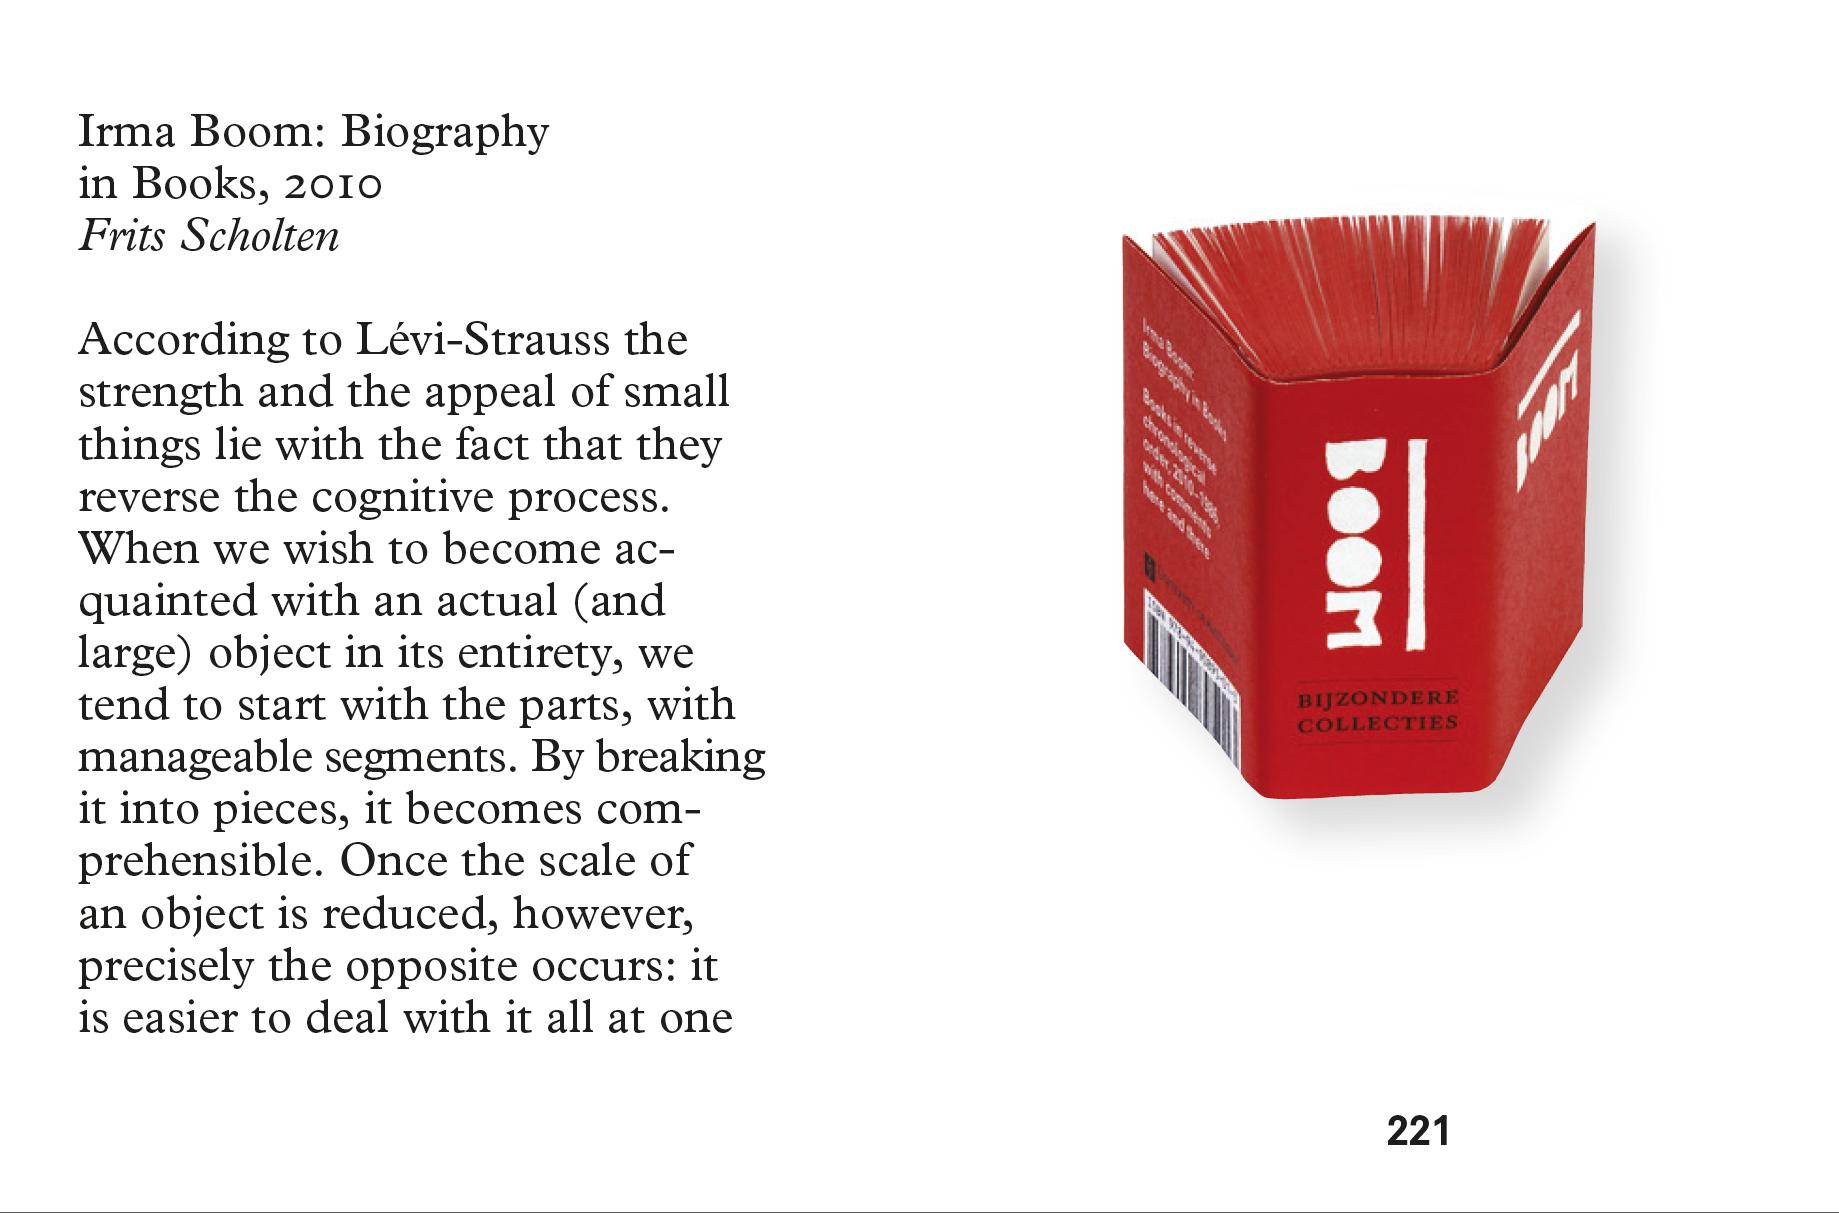 『Irma Boom: Biography』(2010年)